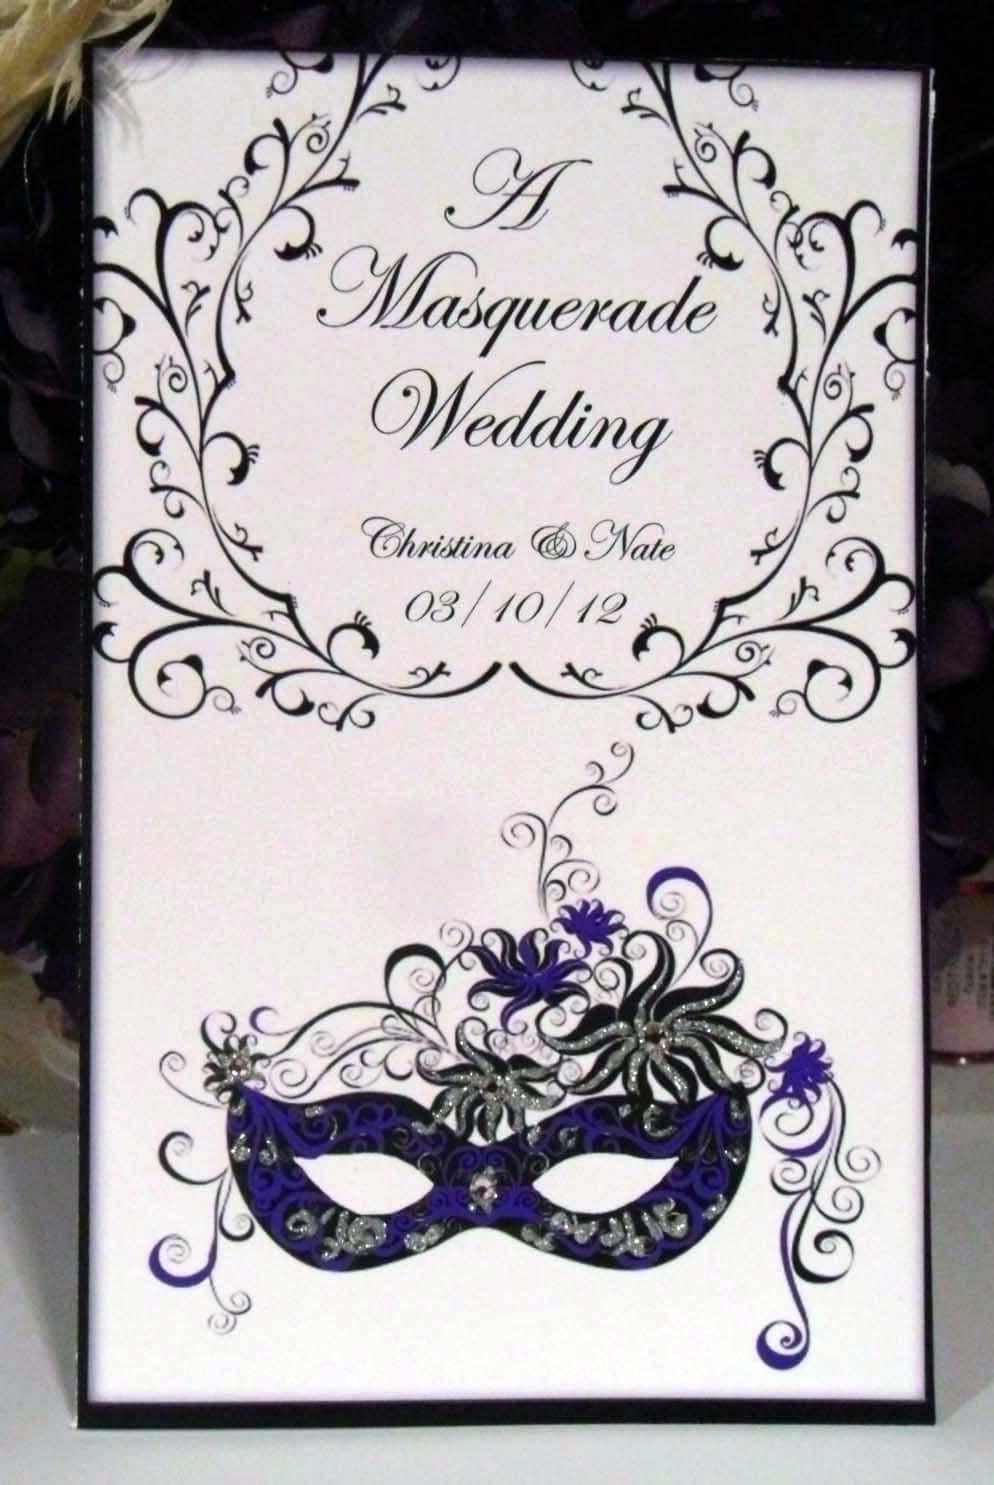 Masquerade Wedding Invitation Book Style Ornate Rsvp